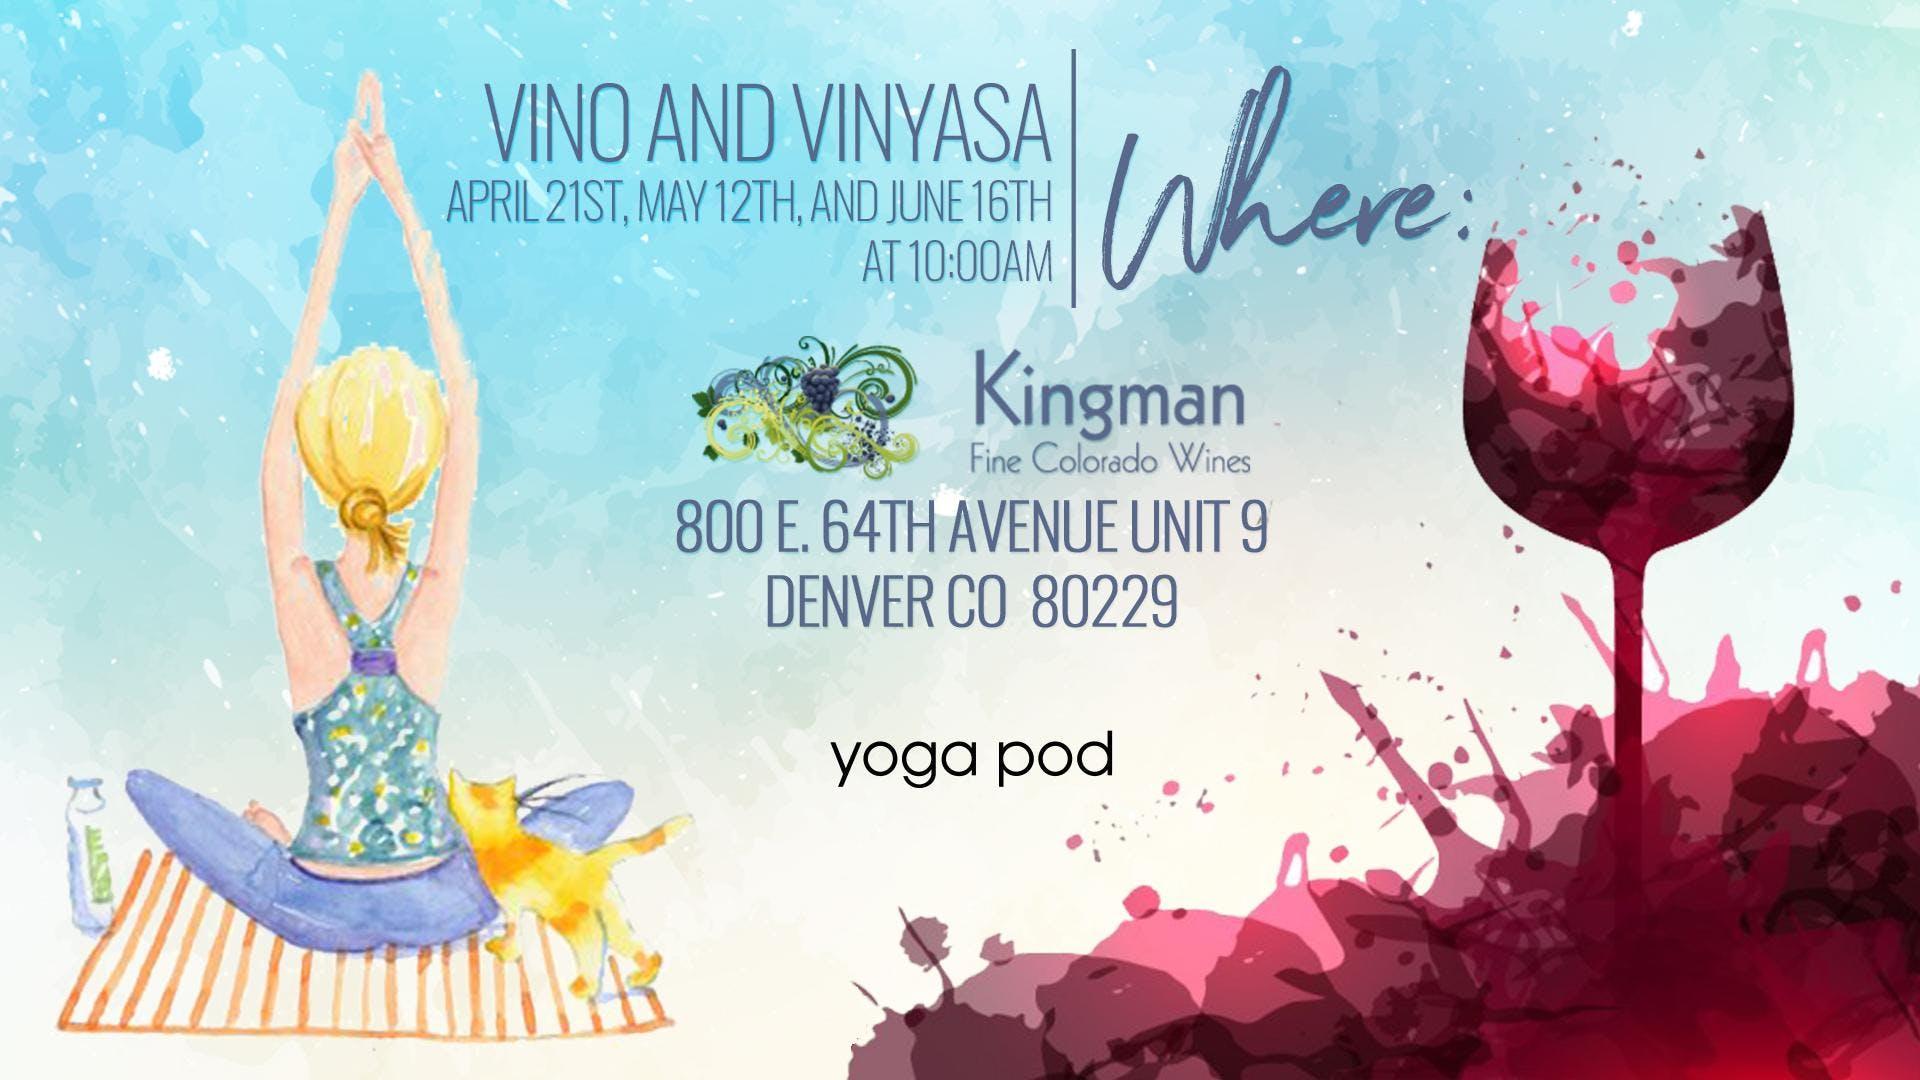 Vino and vinyasa yoga pod class wine tasting kingman estates vino and vinyasa yoga pod class wine tasting kingman estates winery m4hsunfo